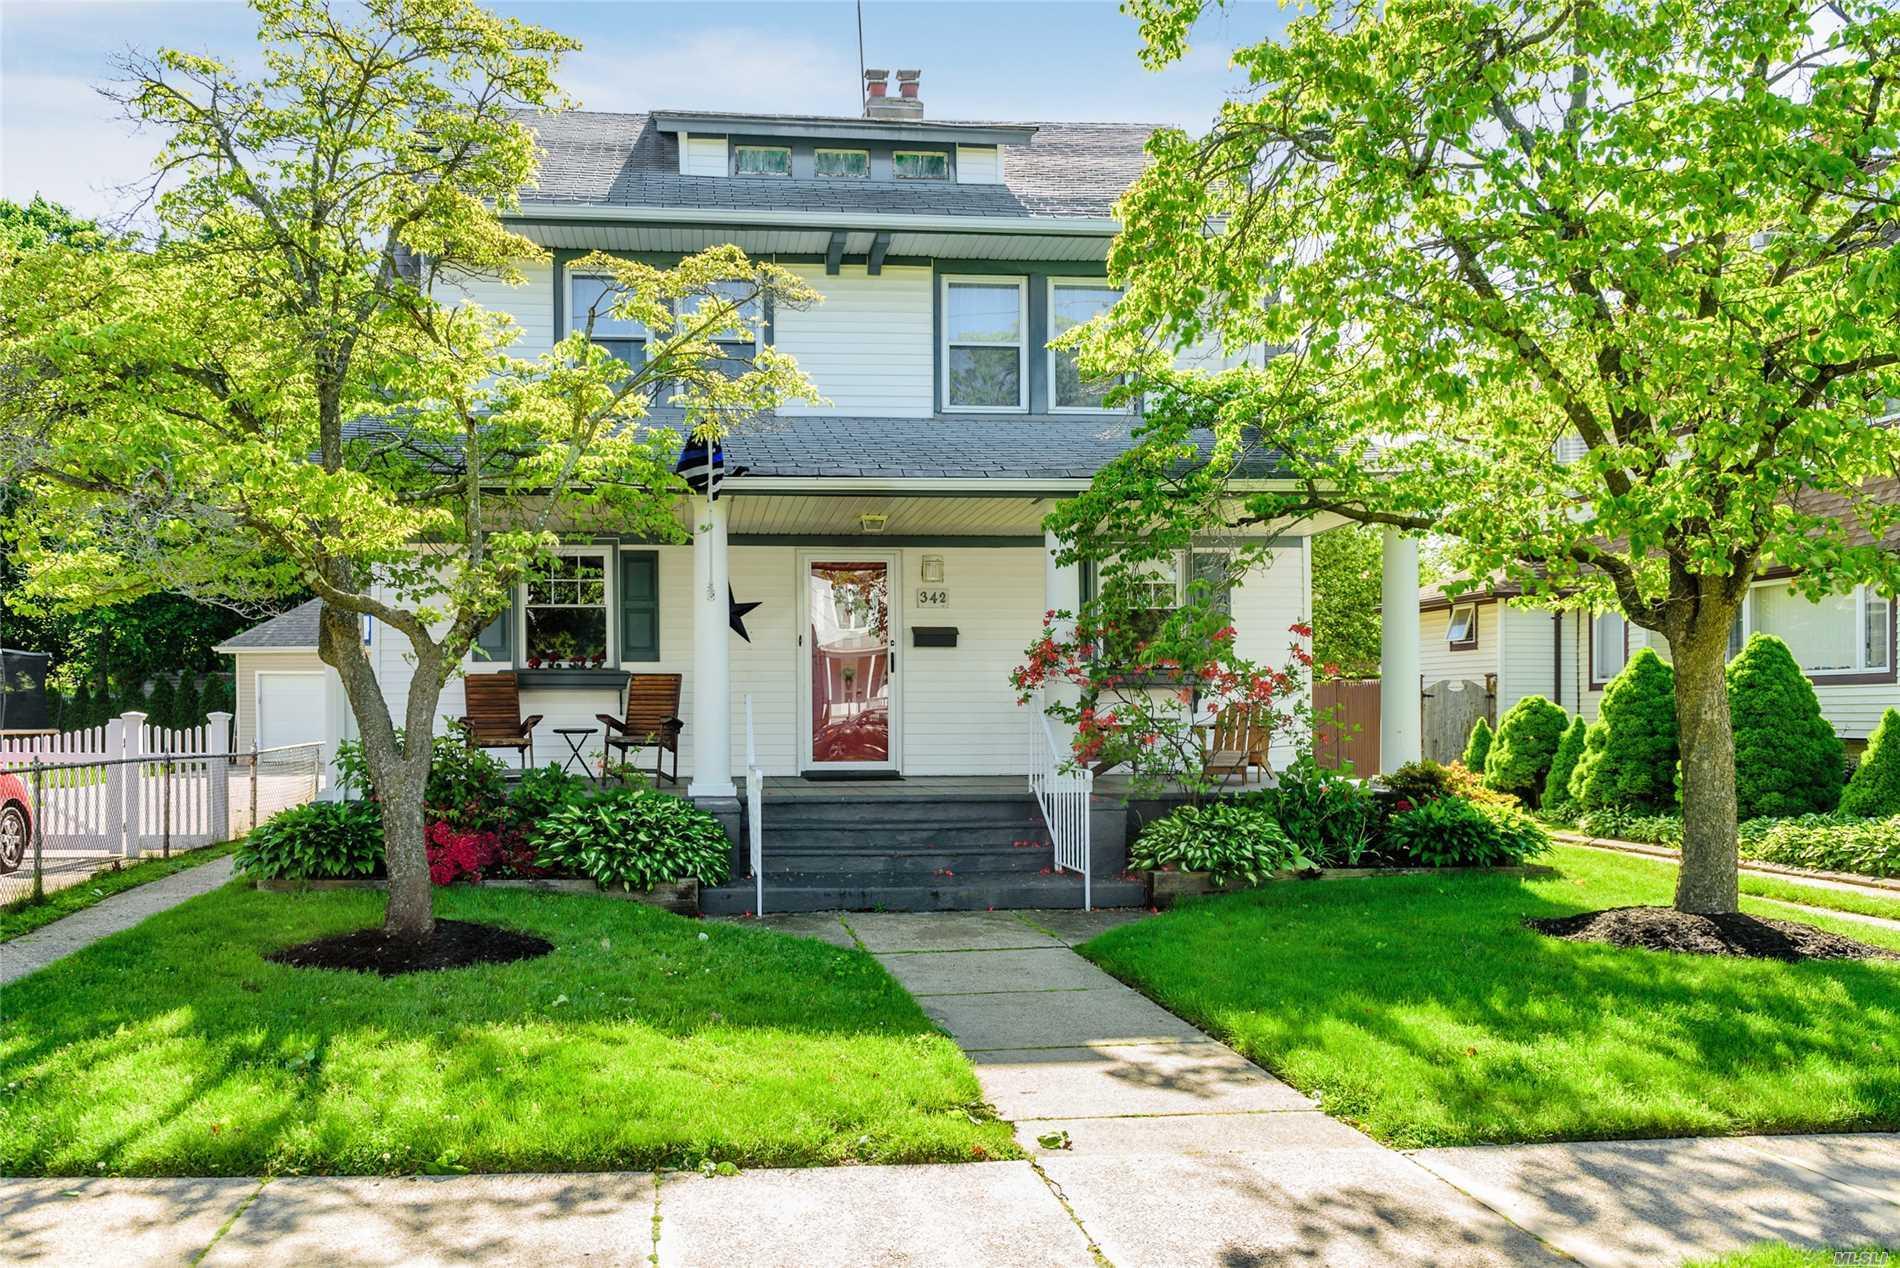 342 Vincent Ave - Lynbrook, New York